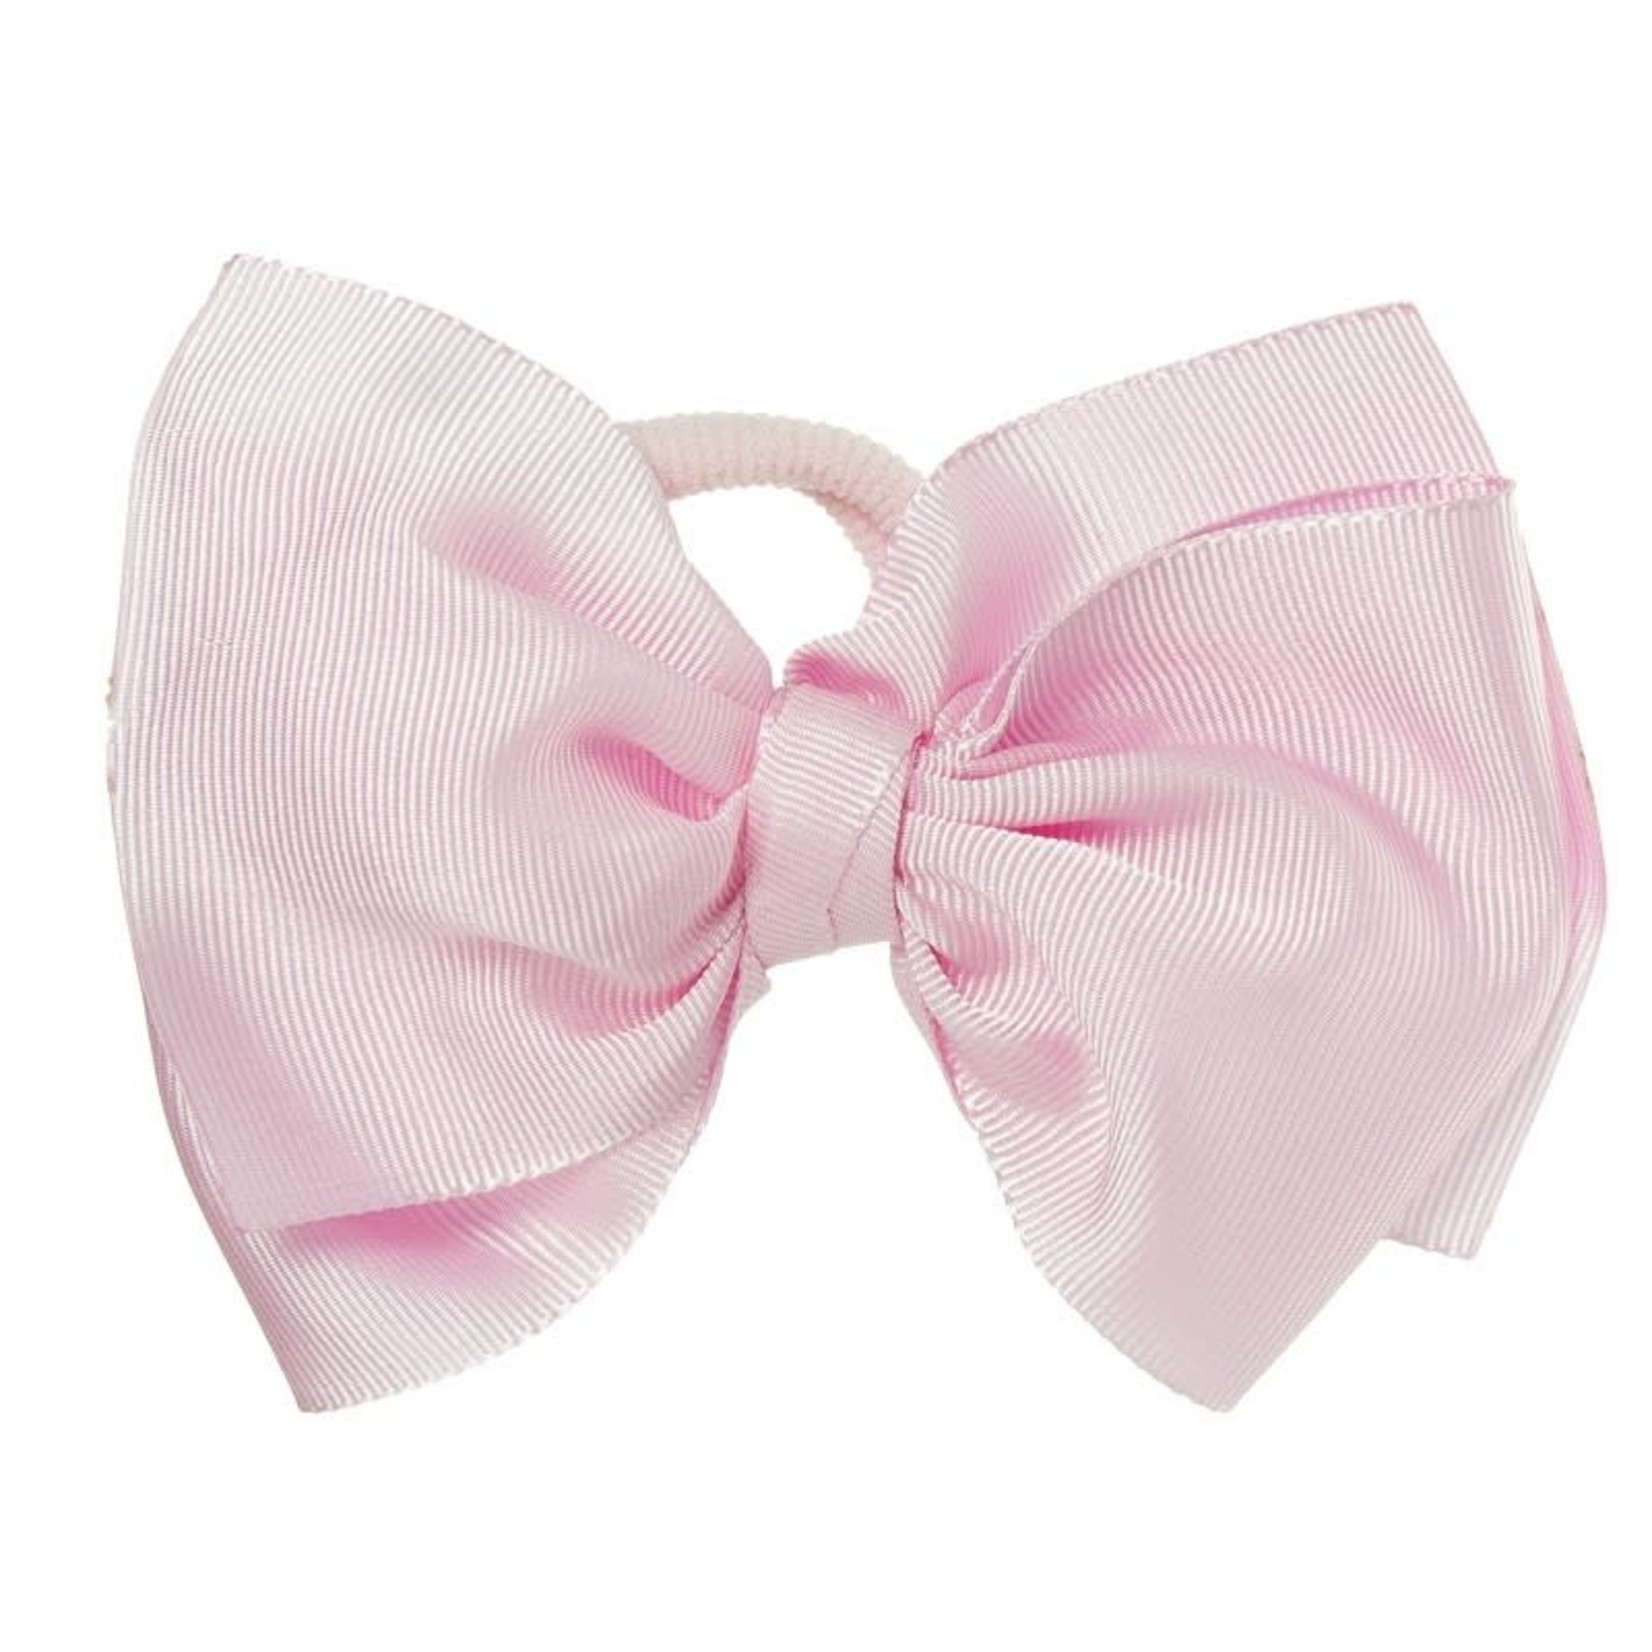 Siena Hair Bow - Light Pink